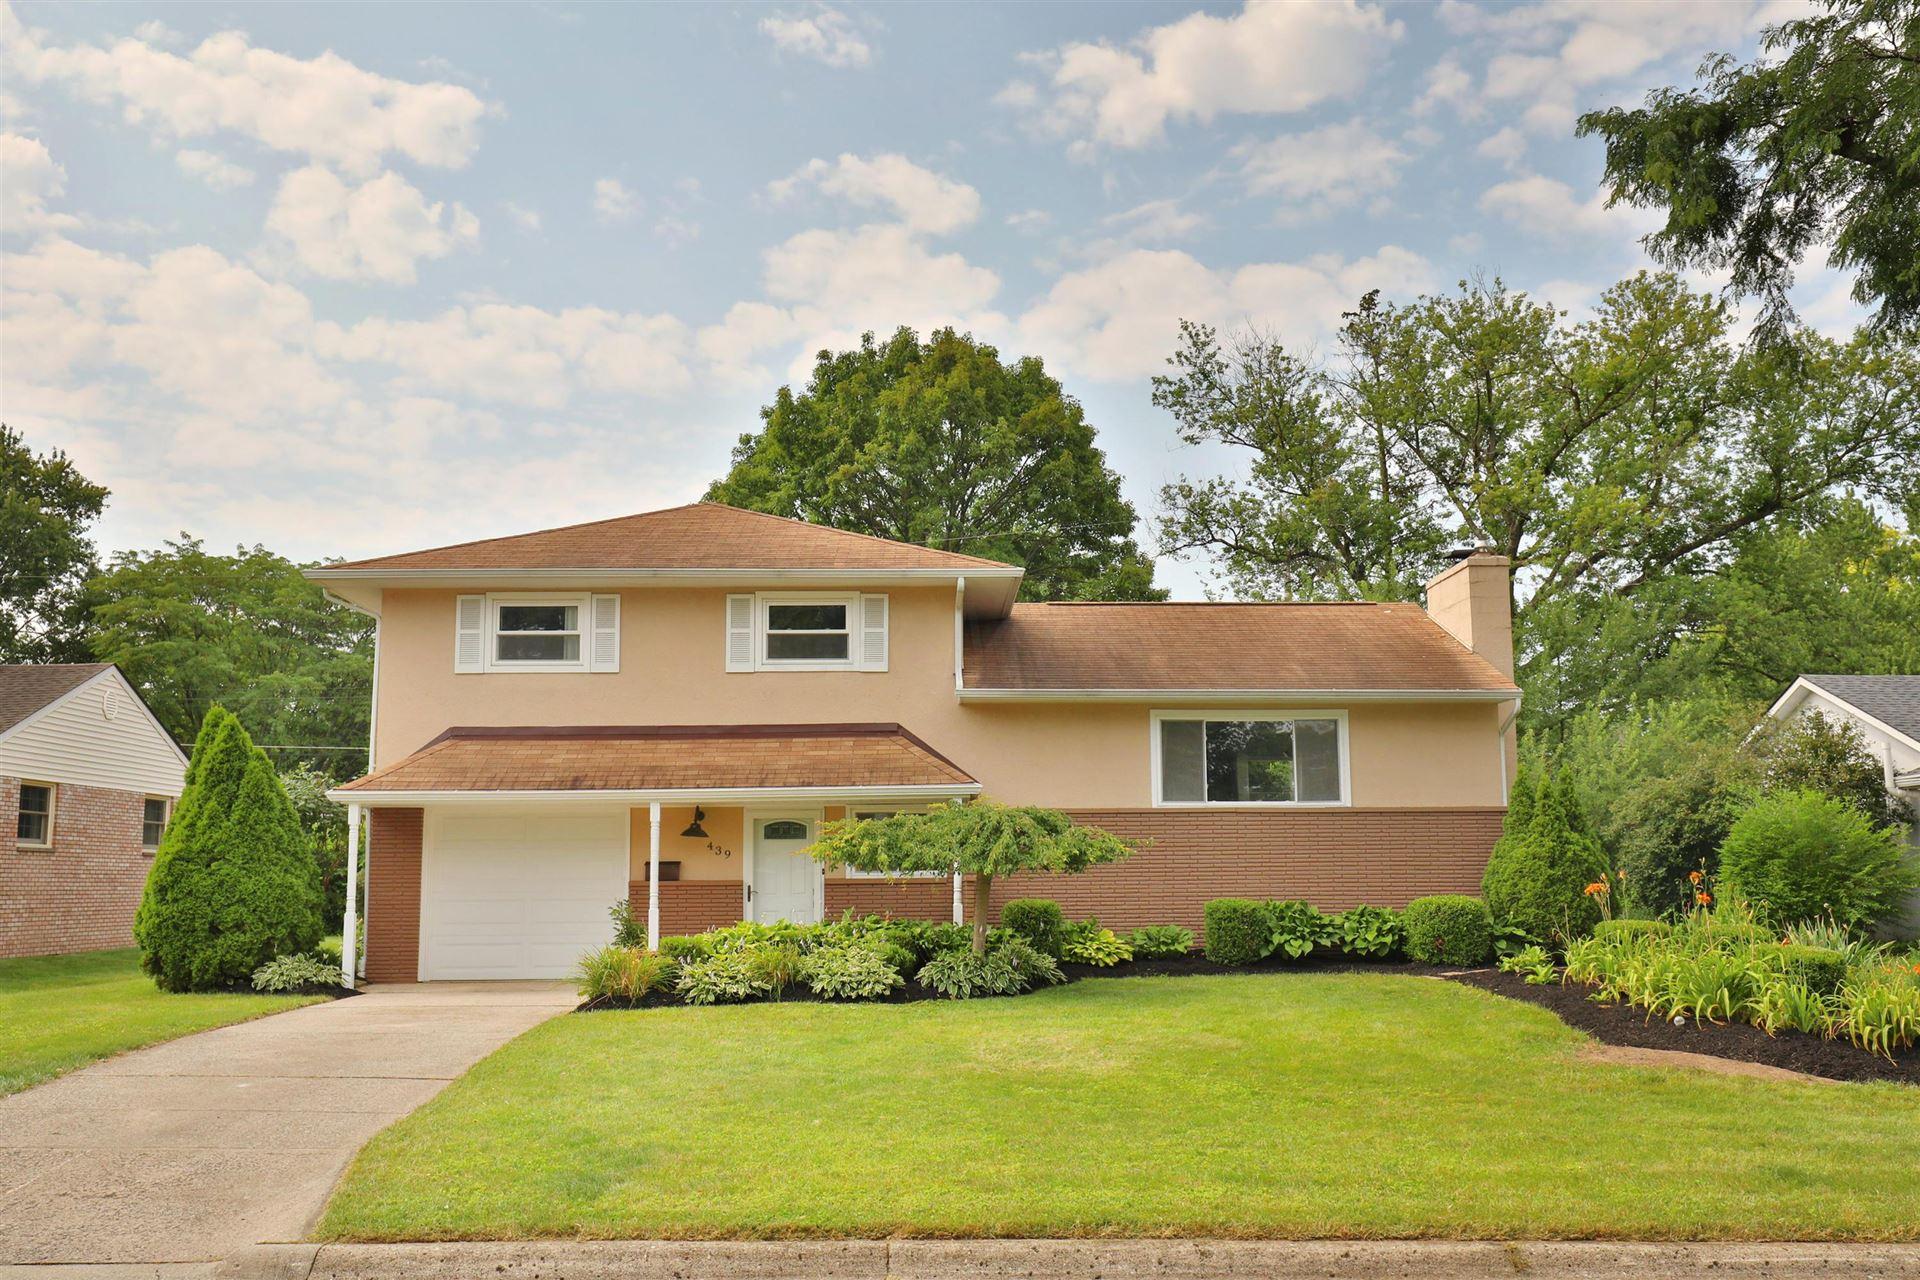 Photo of 439 Ridgedale Drive N, Worthington, OH 43085 (MLS # 221028051)